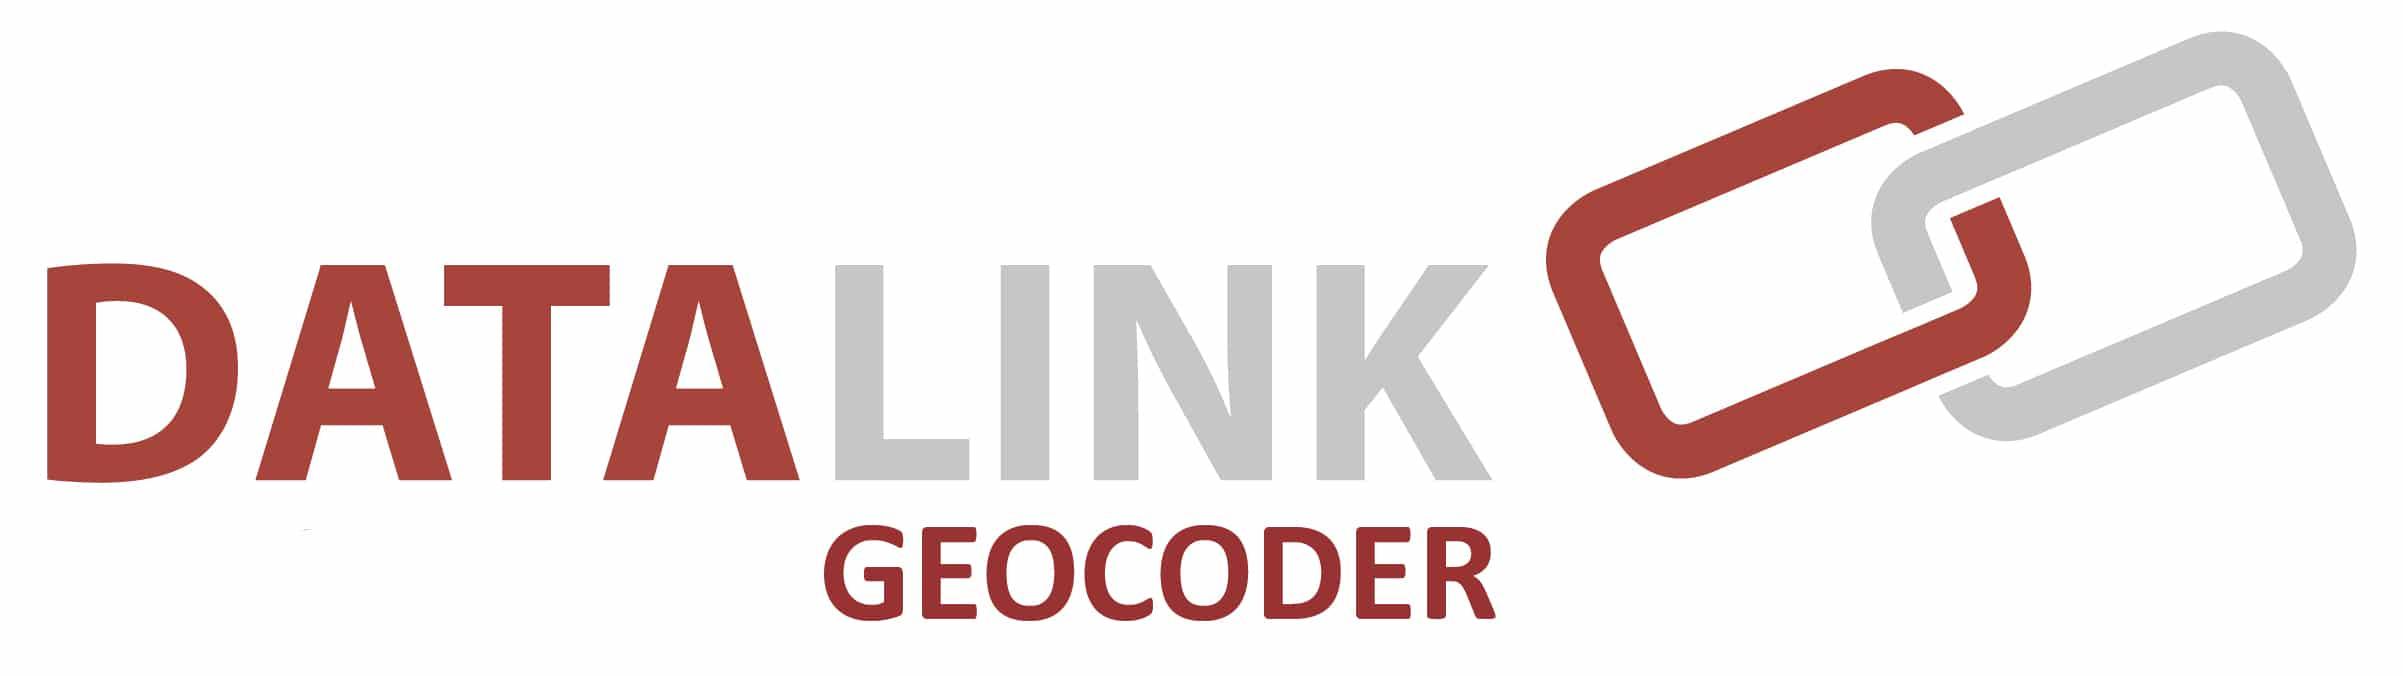 Datalink Geocoder